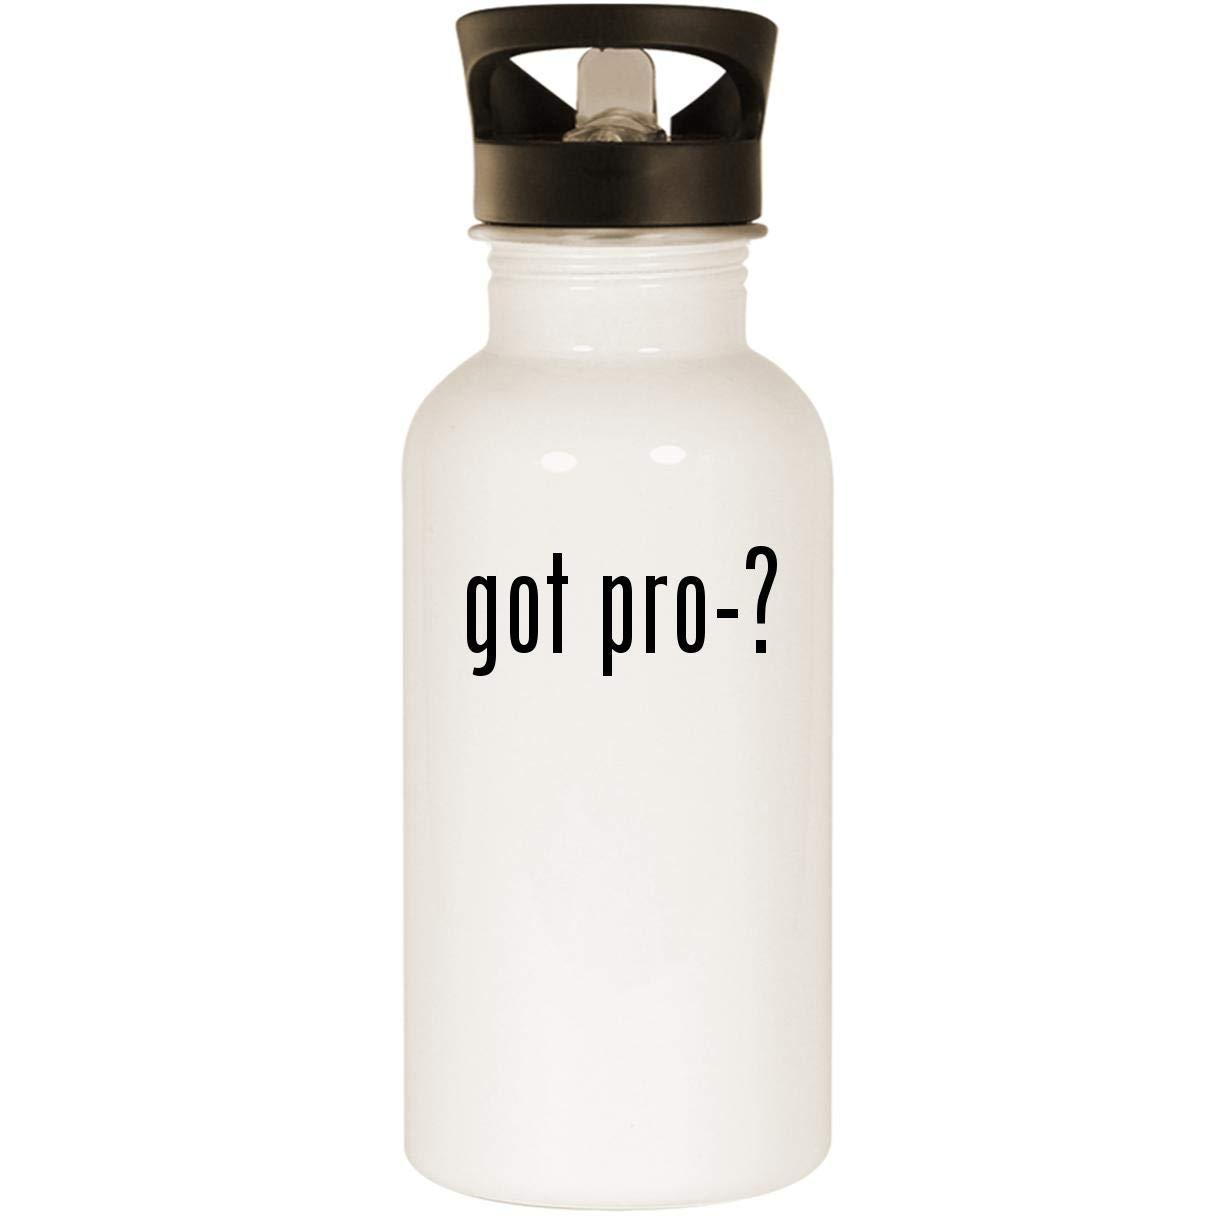 got pro-? - Stainless Steel 20oz Road Ready Water Bottle, White